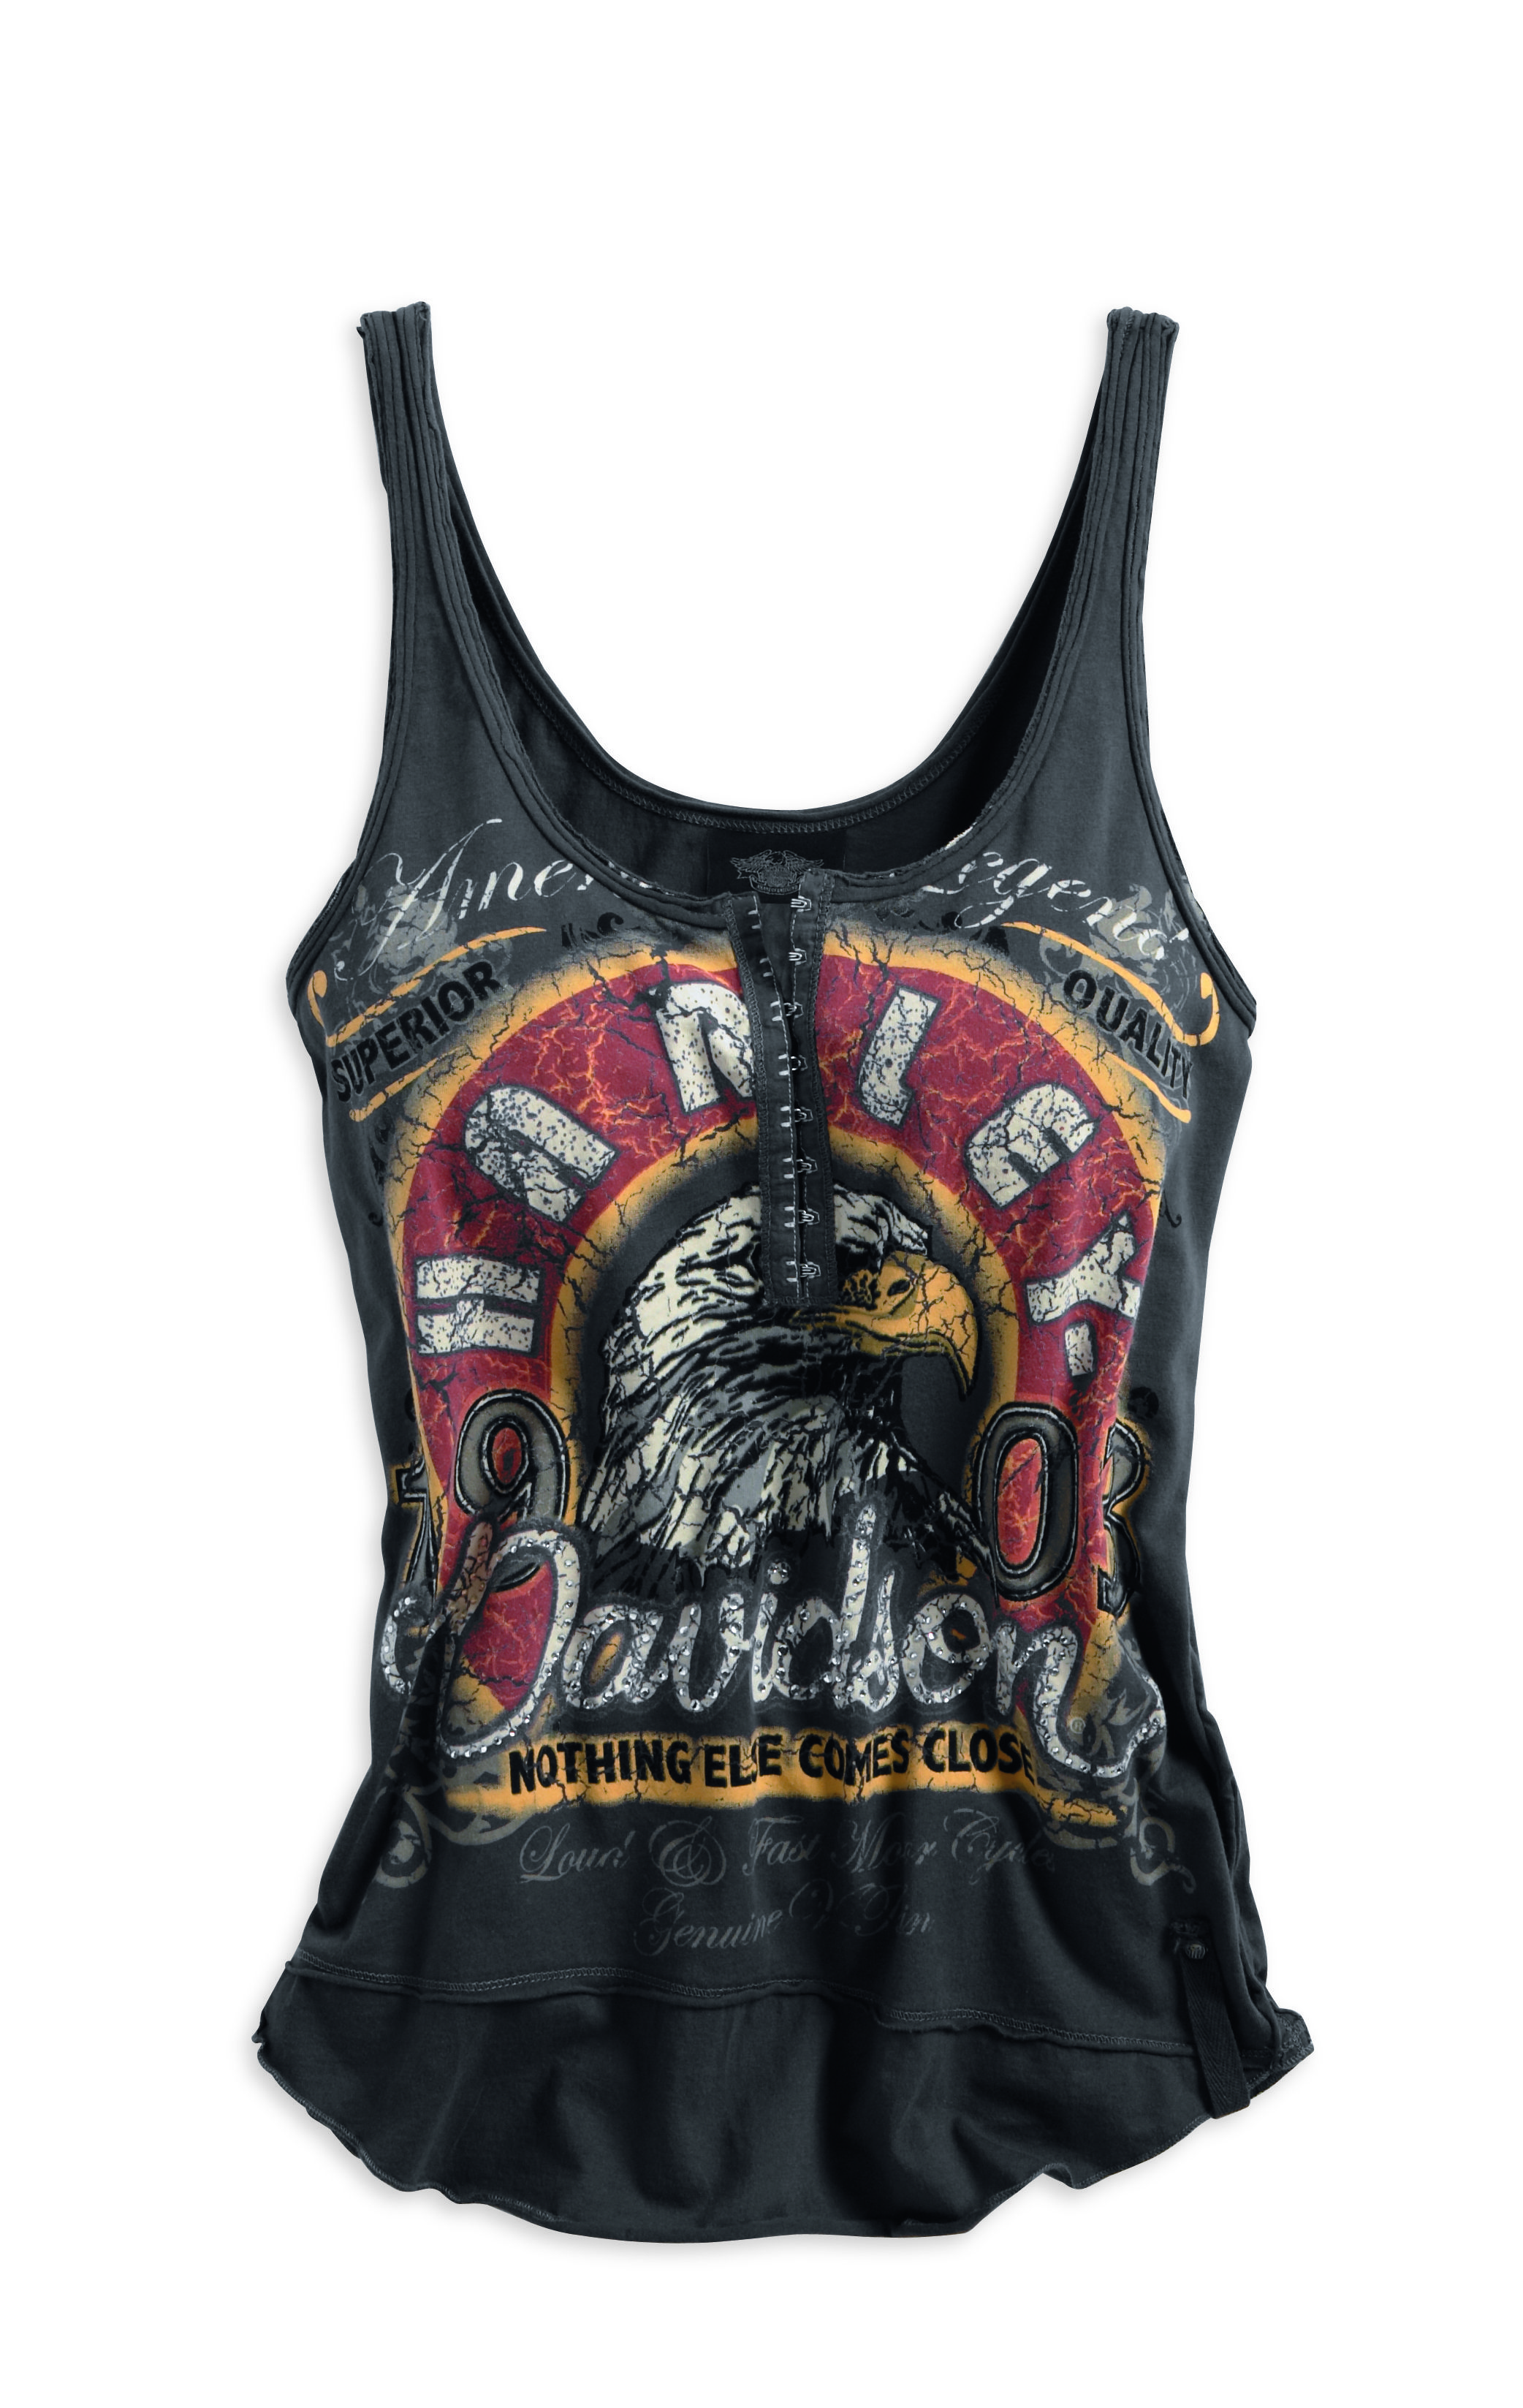 189595e2 American Legion Harley-Davidson Tank | rumbleon.com| #rumbleON #harley #tank  #women #fashion #bikerstyle #bikerchic